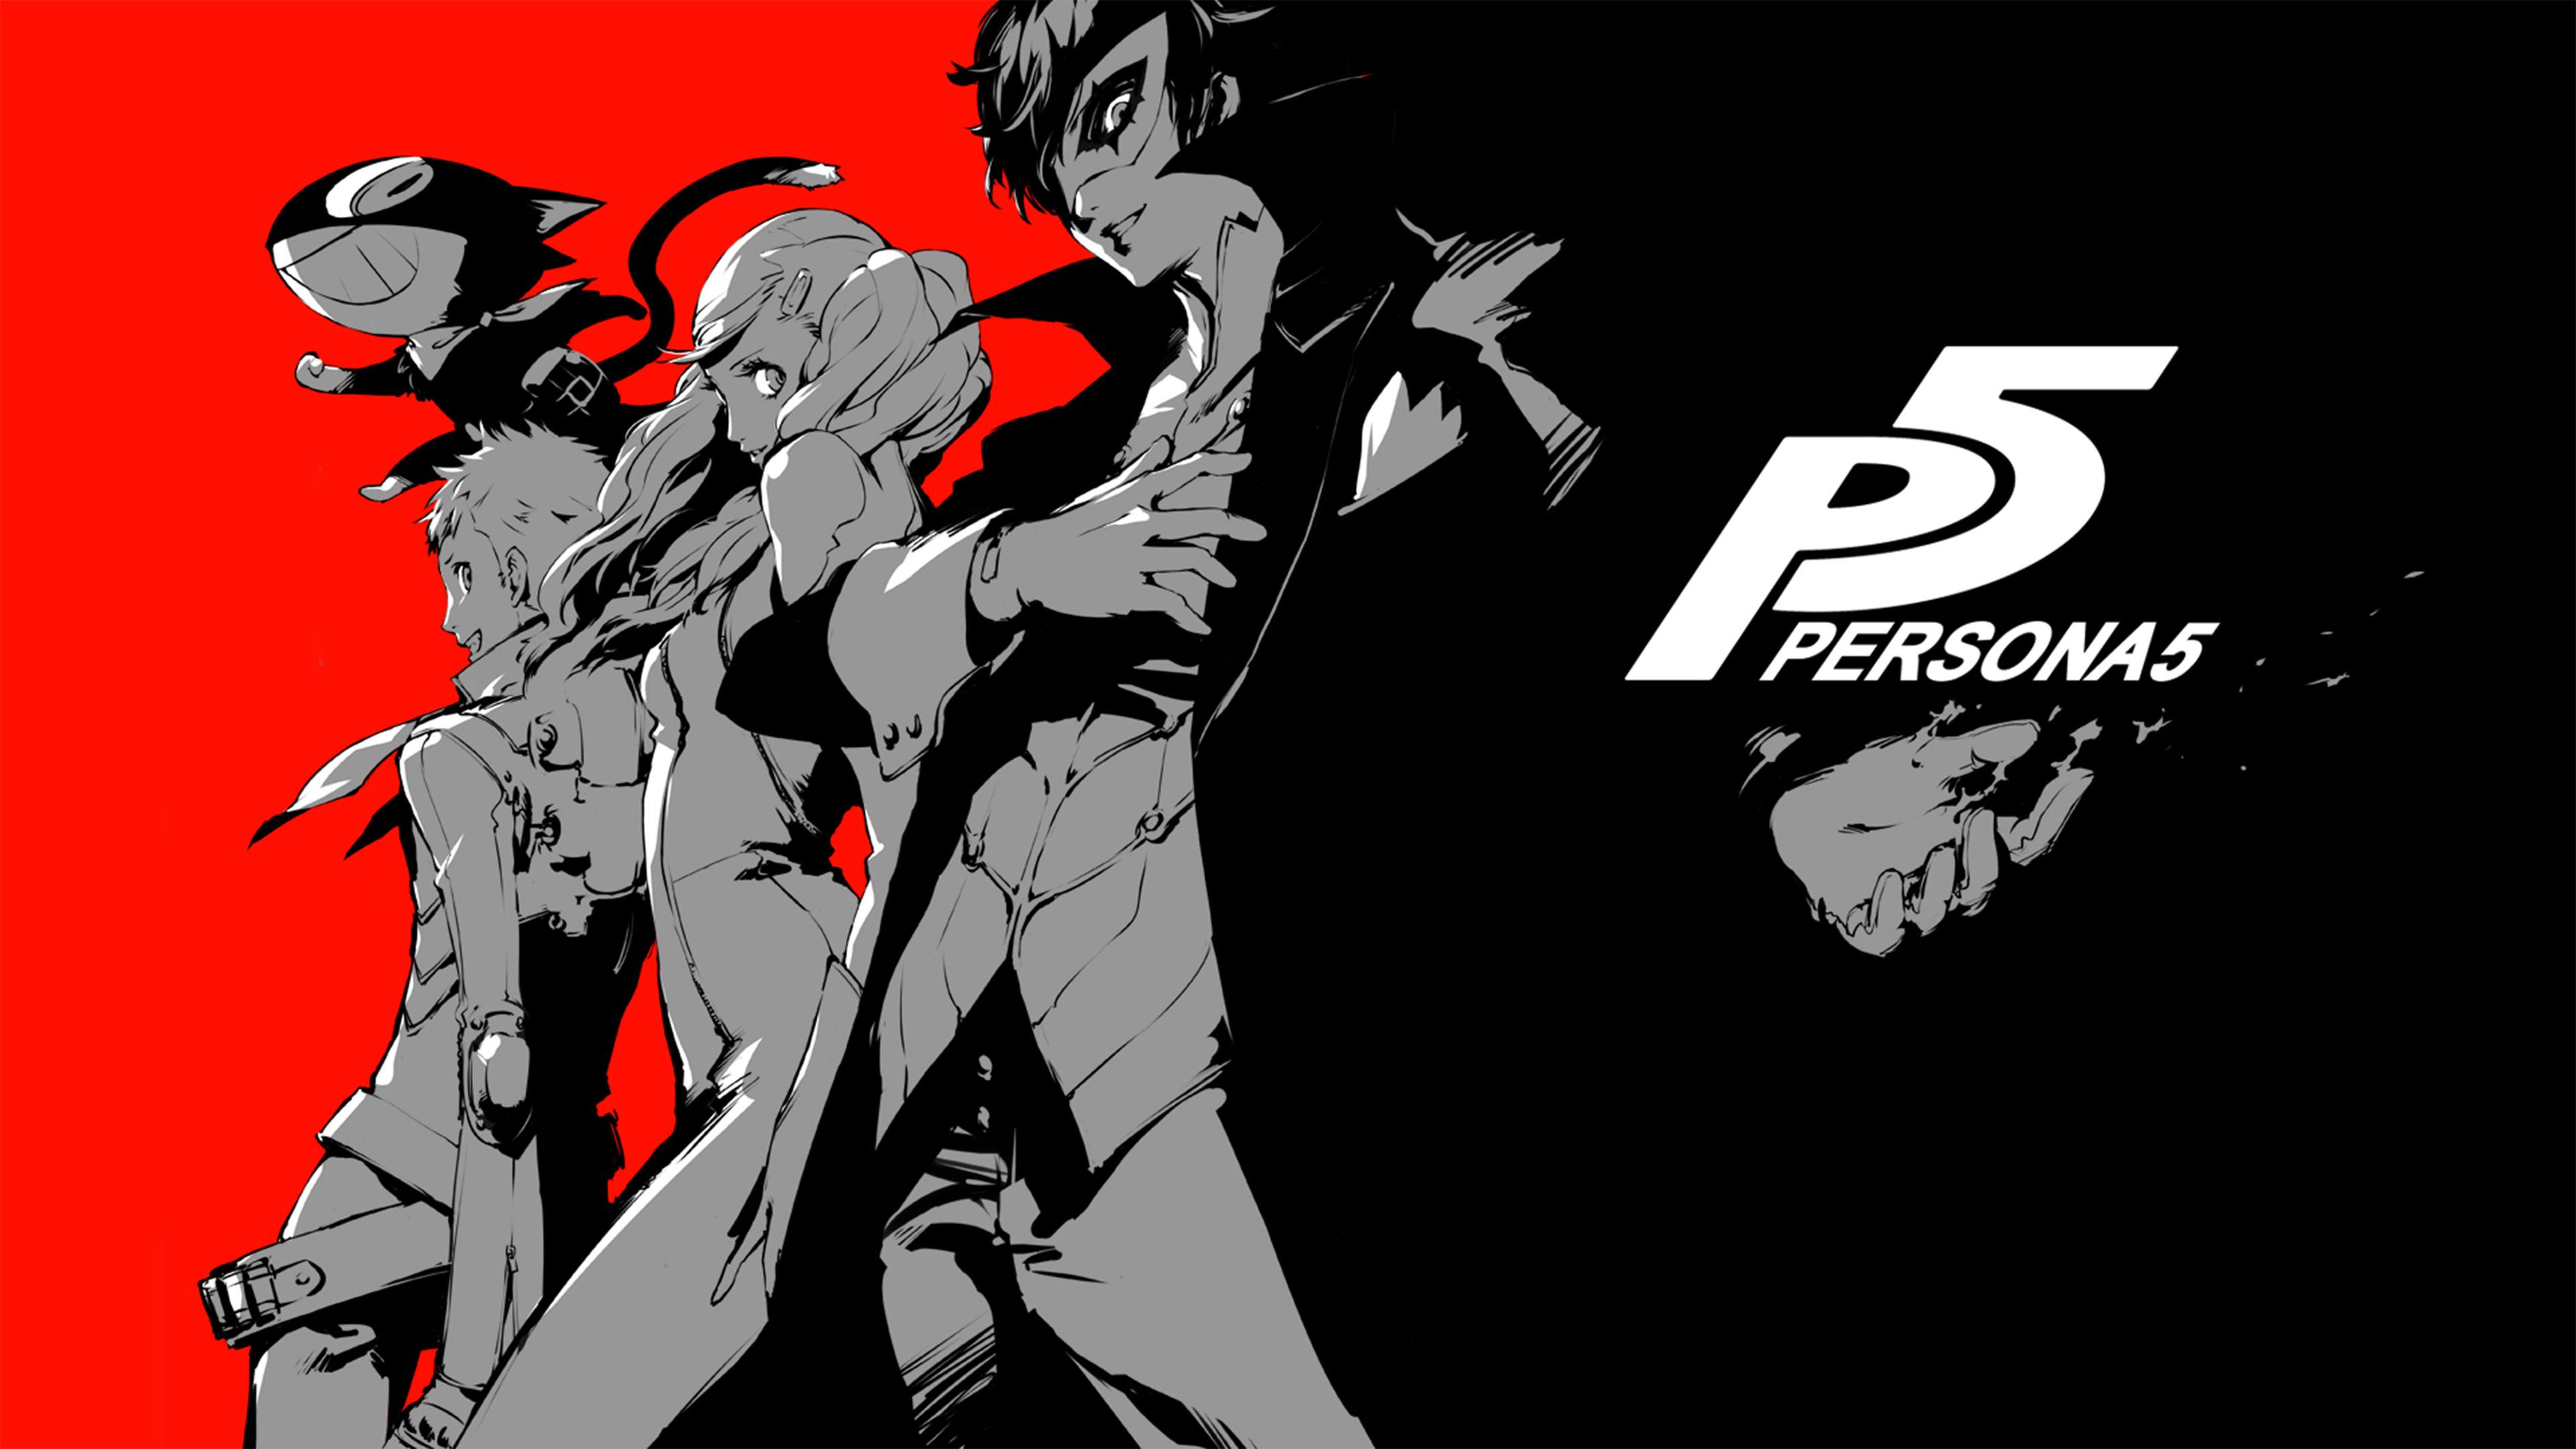 Persona 5 Iphone Wallpaper Persona 5 Wallpapers In Ultra Hd 4k Gameranx